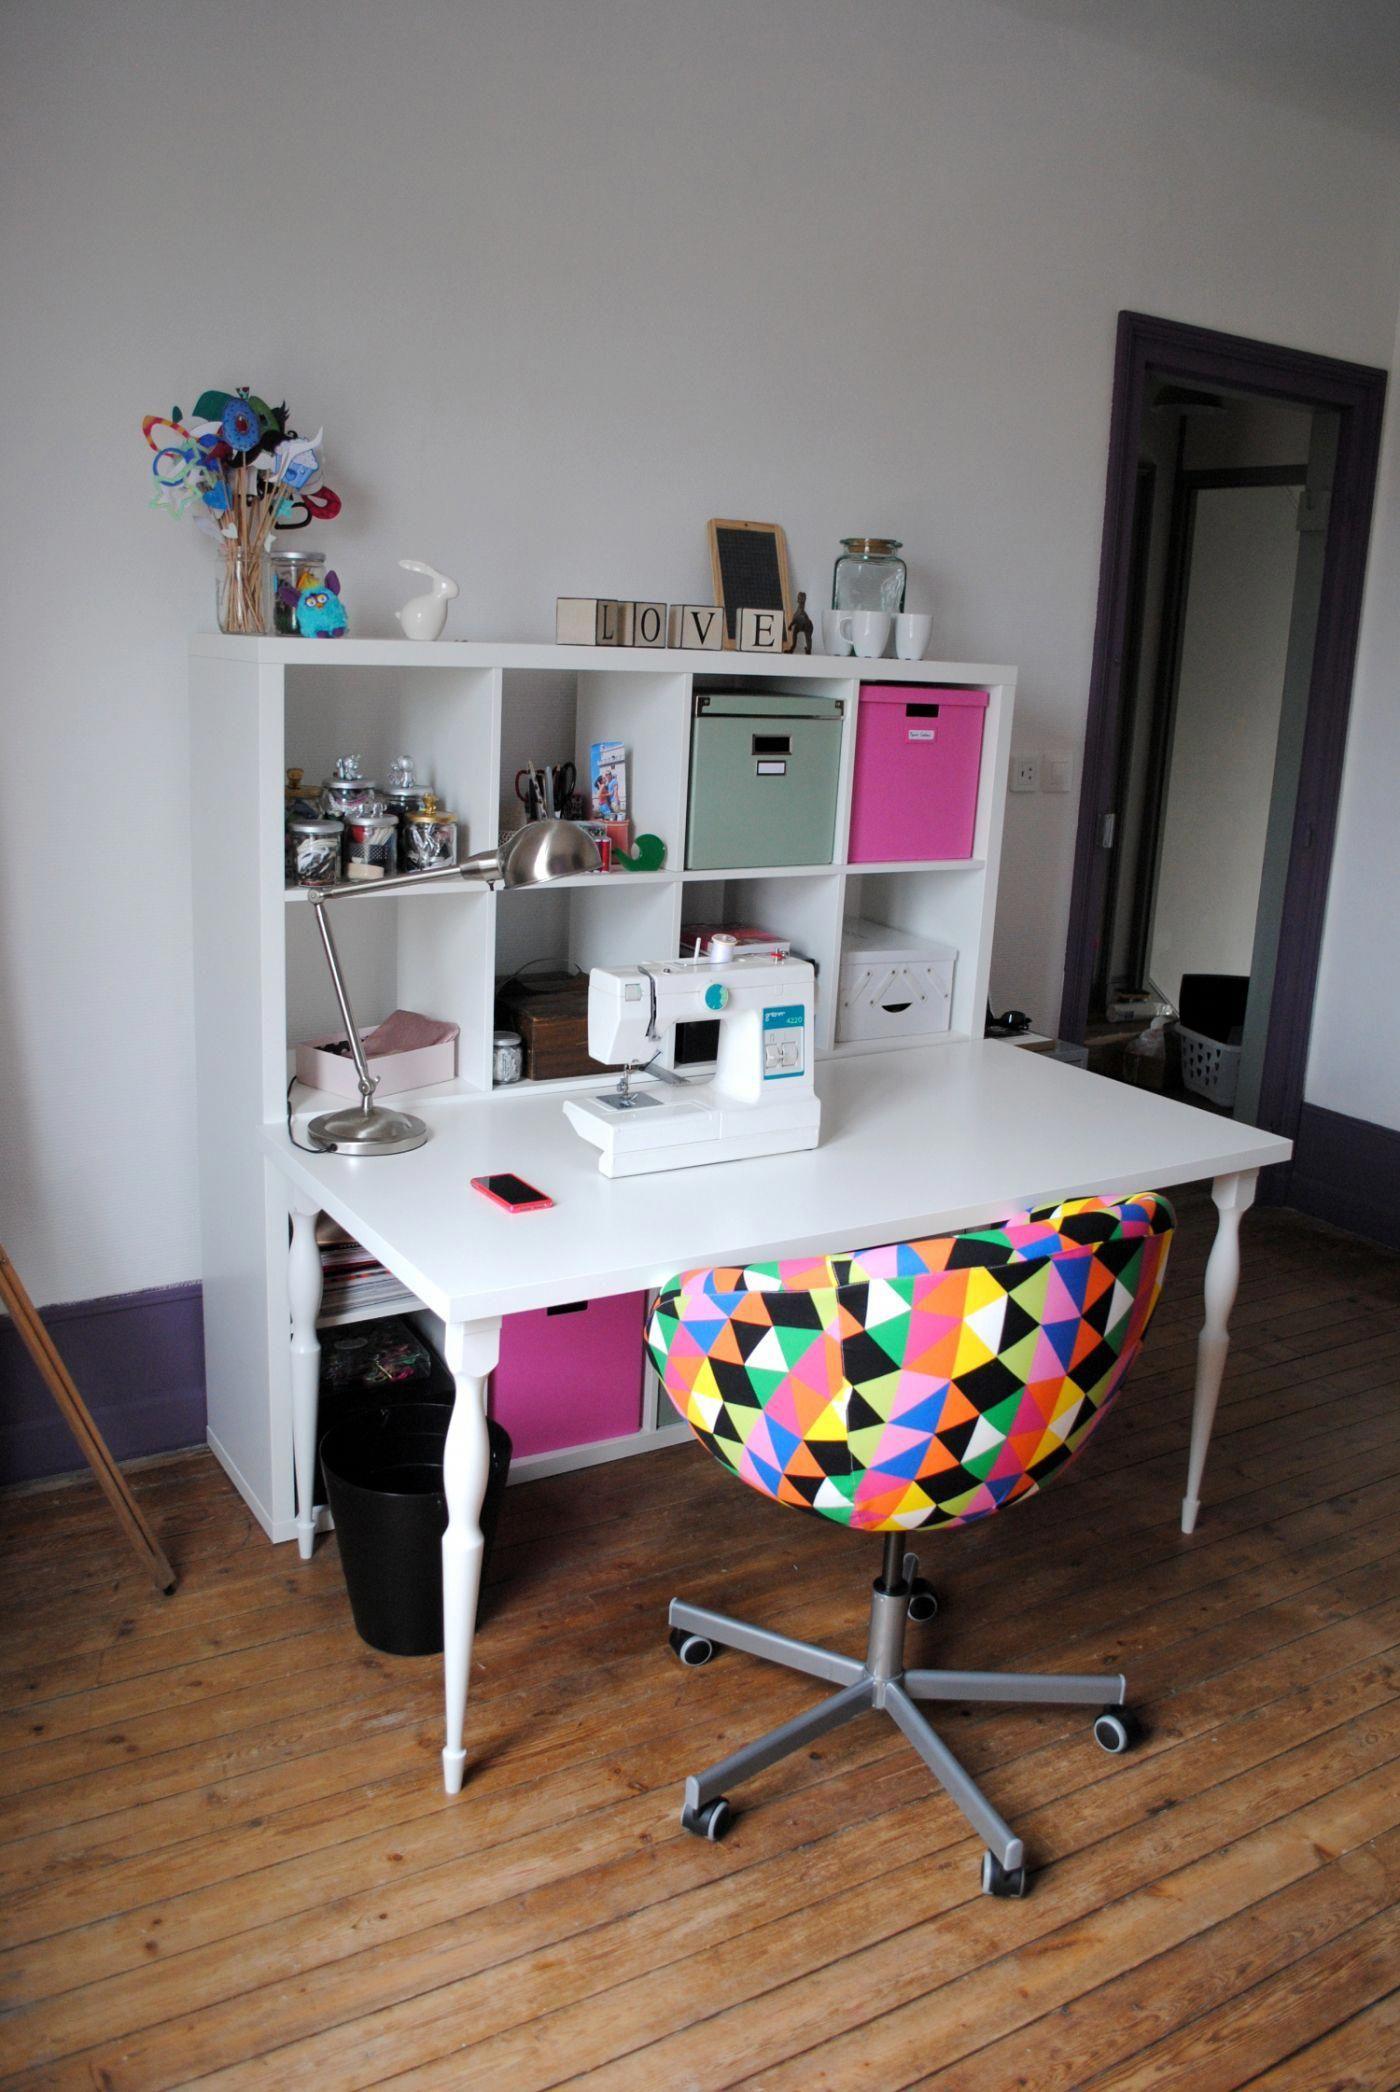 Ikea Skruvsta Draaifauteuil.Atelier Diy Couture Atelier Couture Kallax Ikea Fauteuil